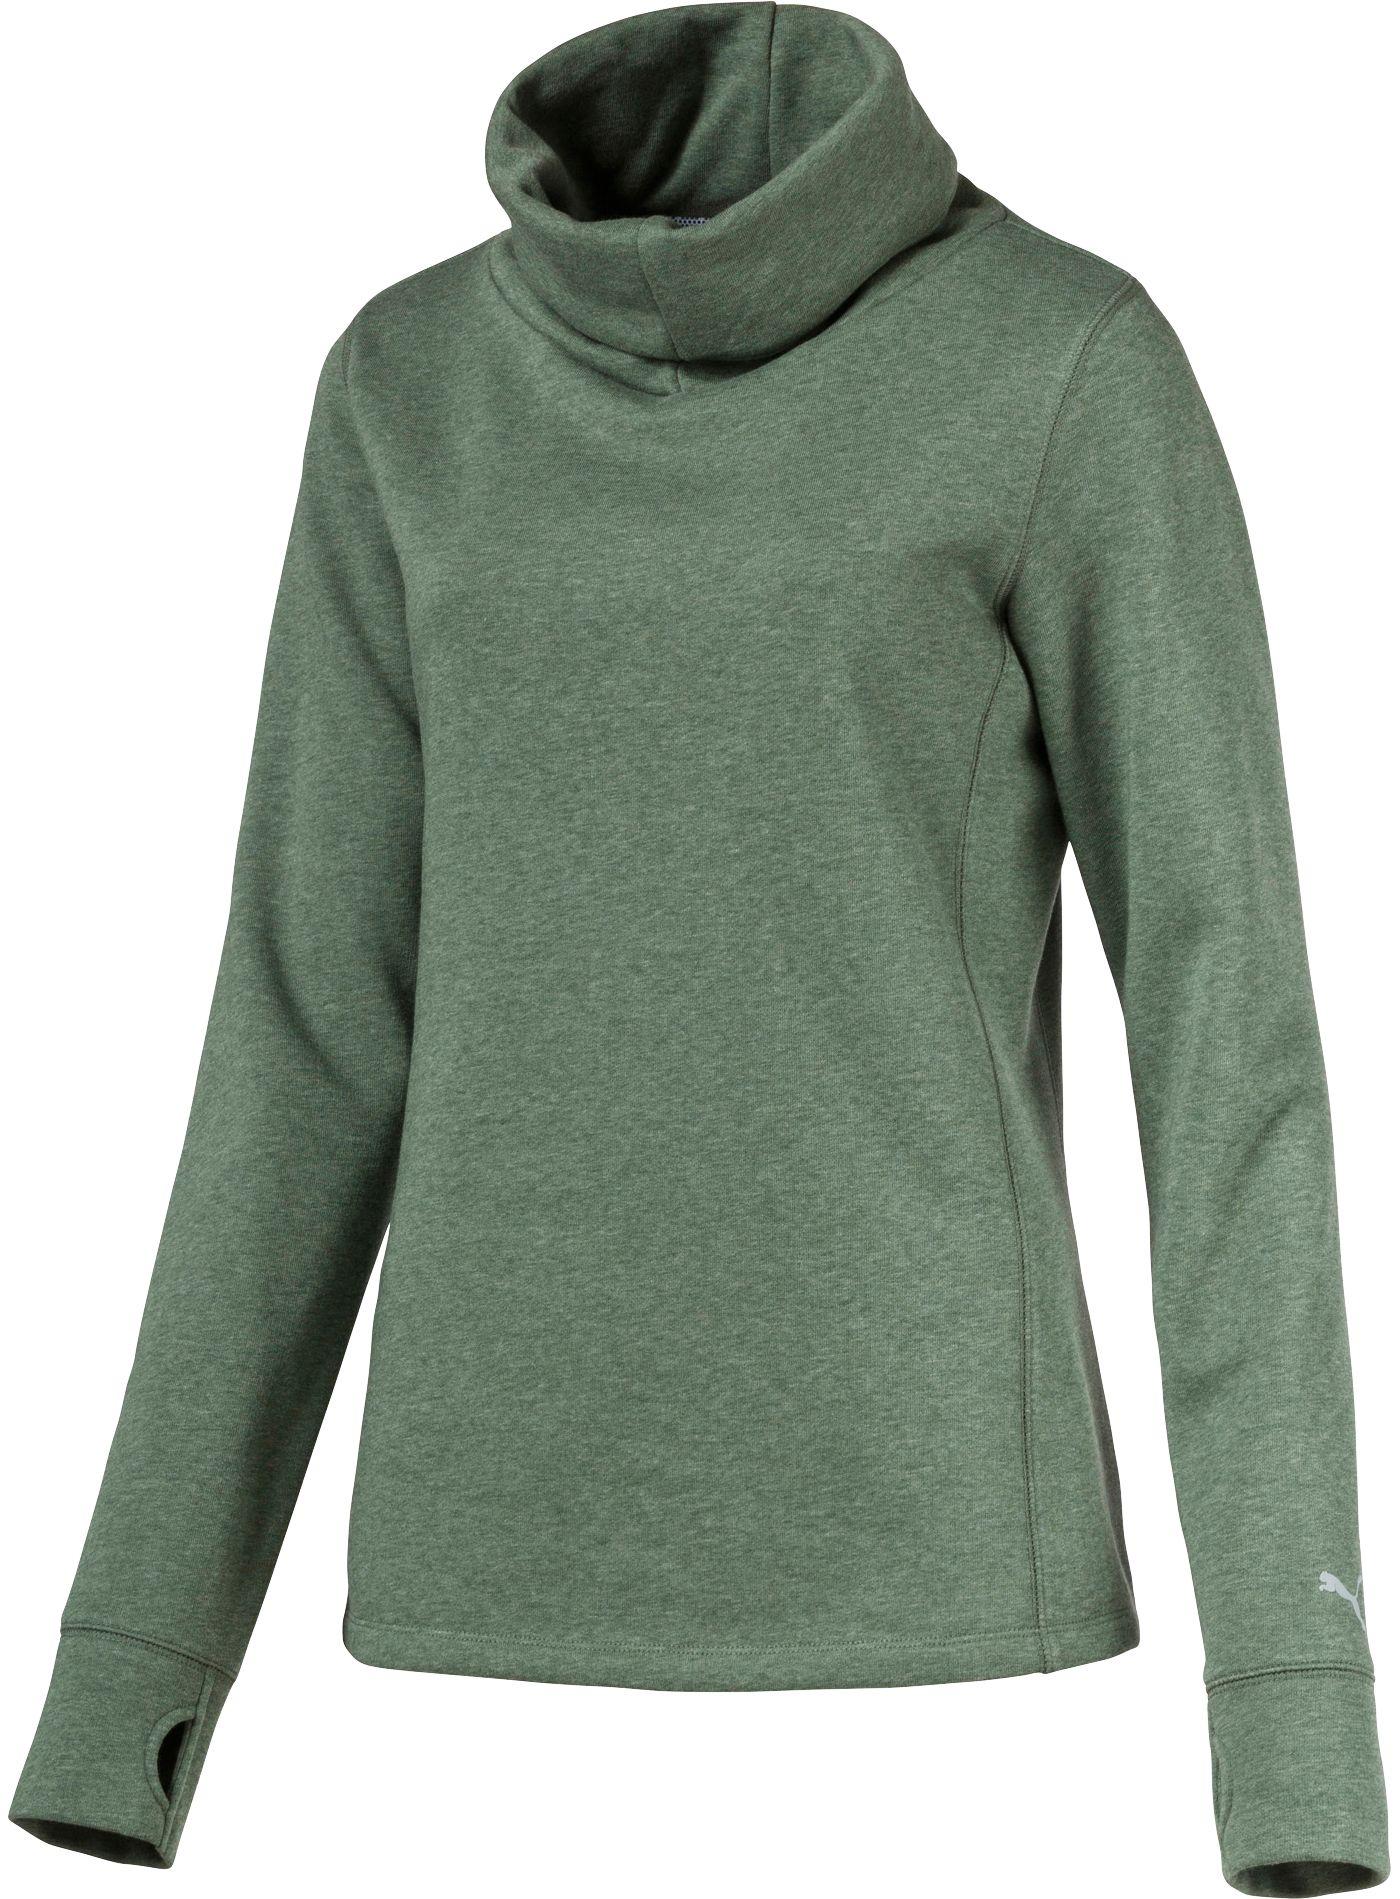 PUMA Women's Cozy Golf Pullover